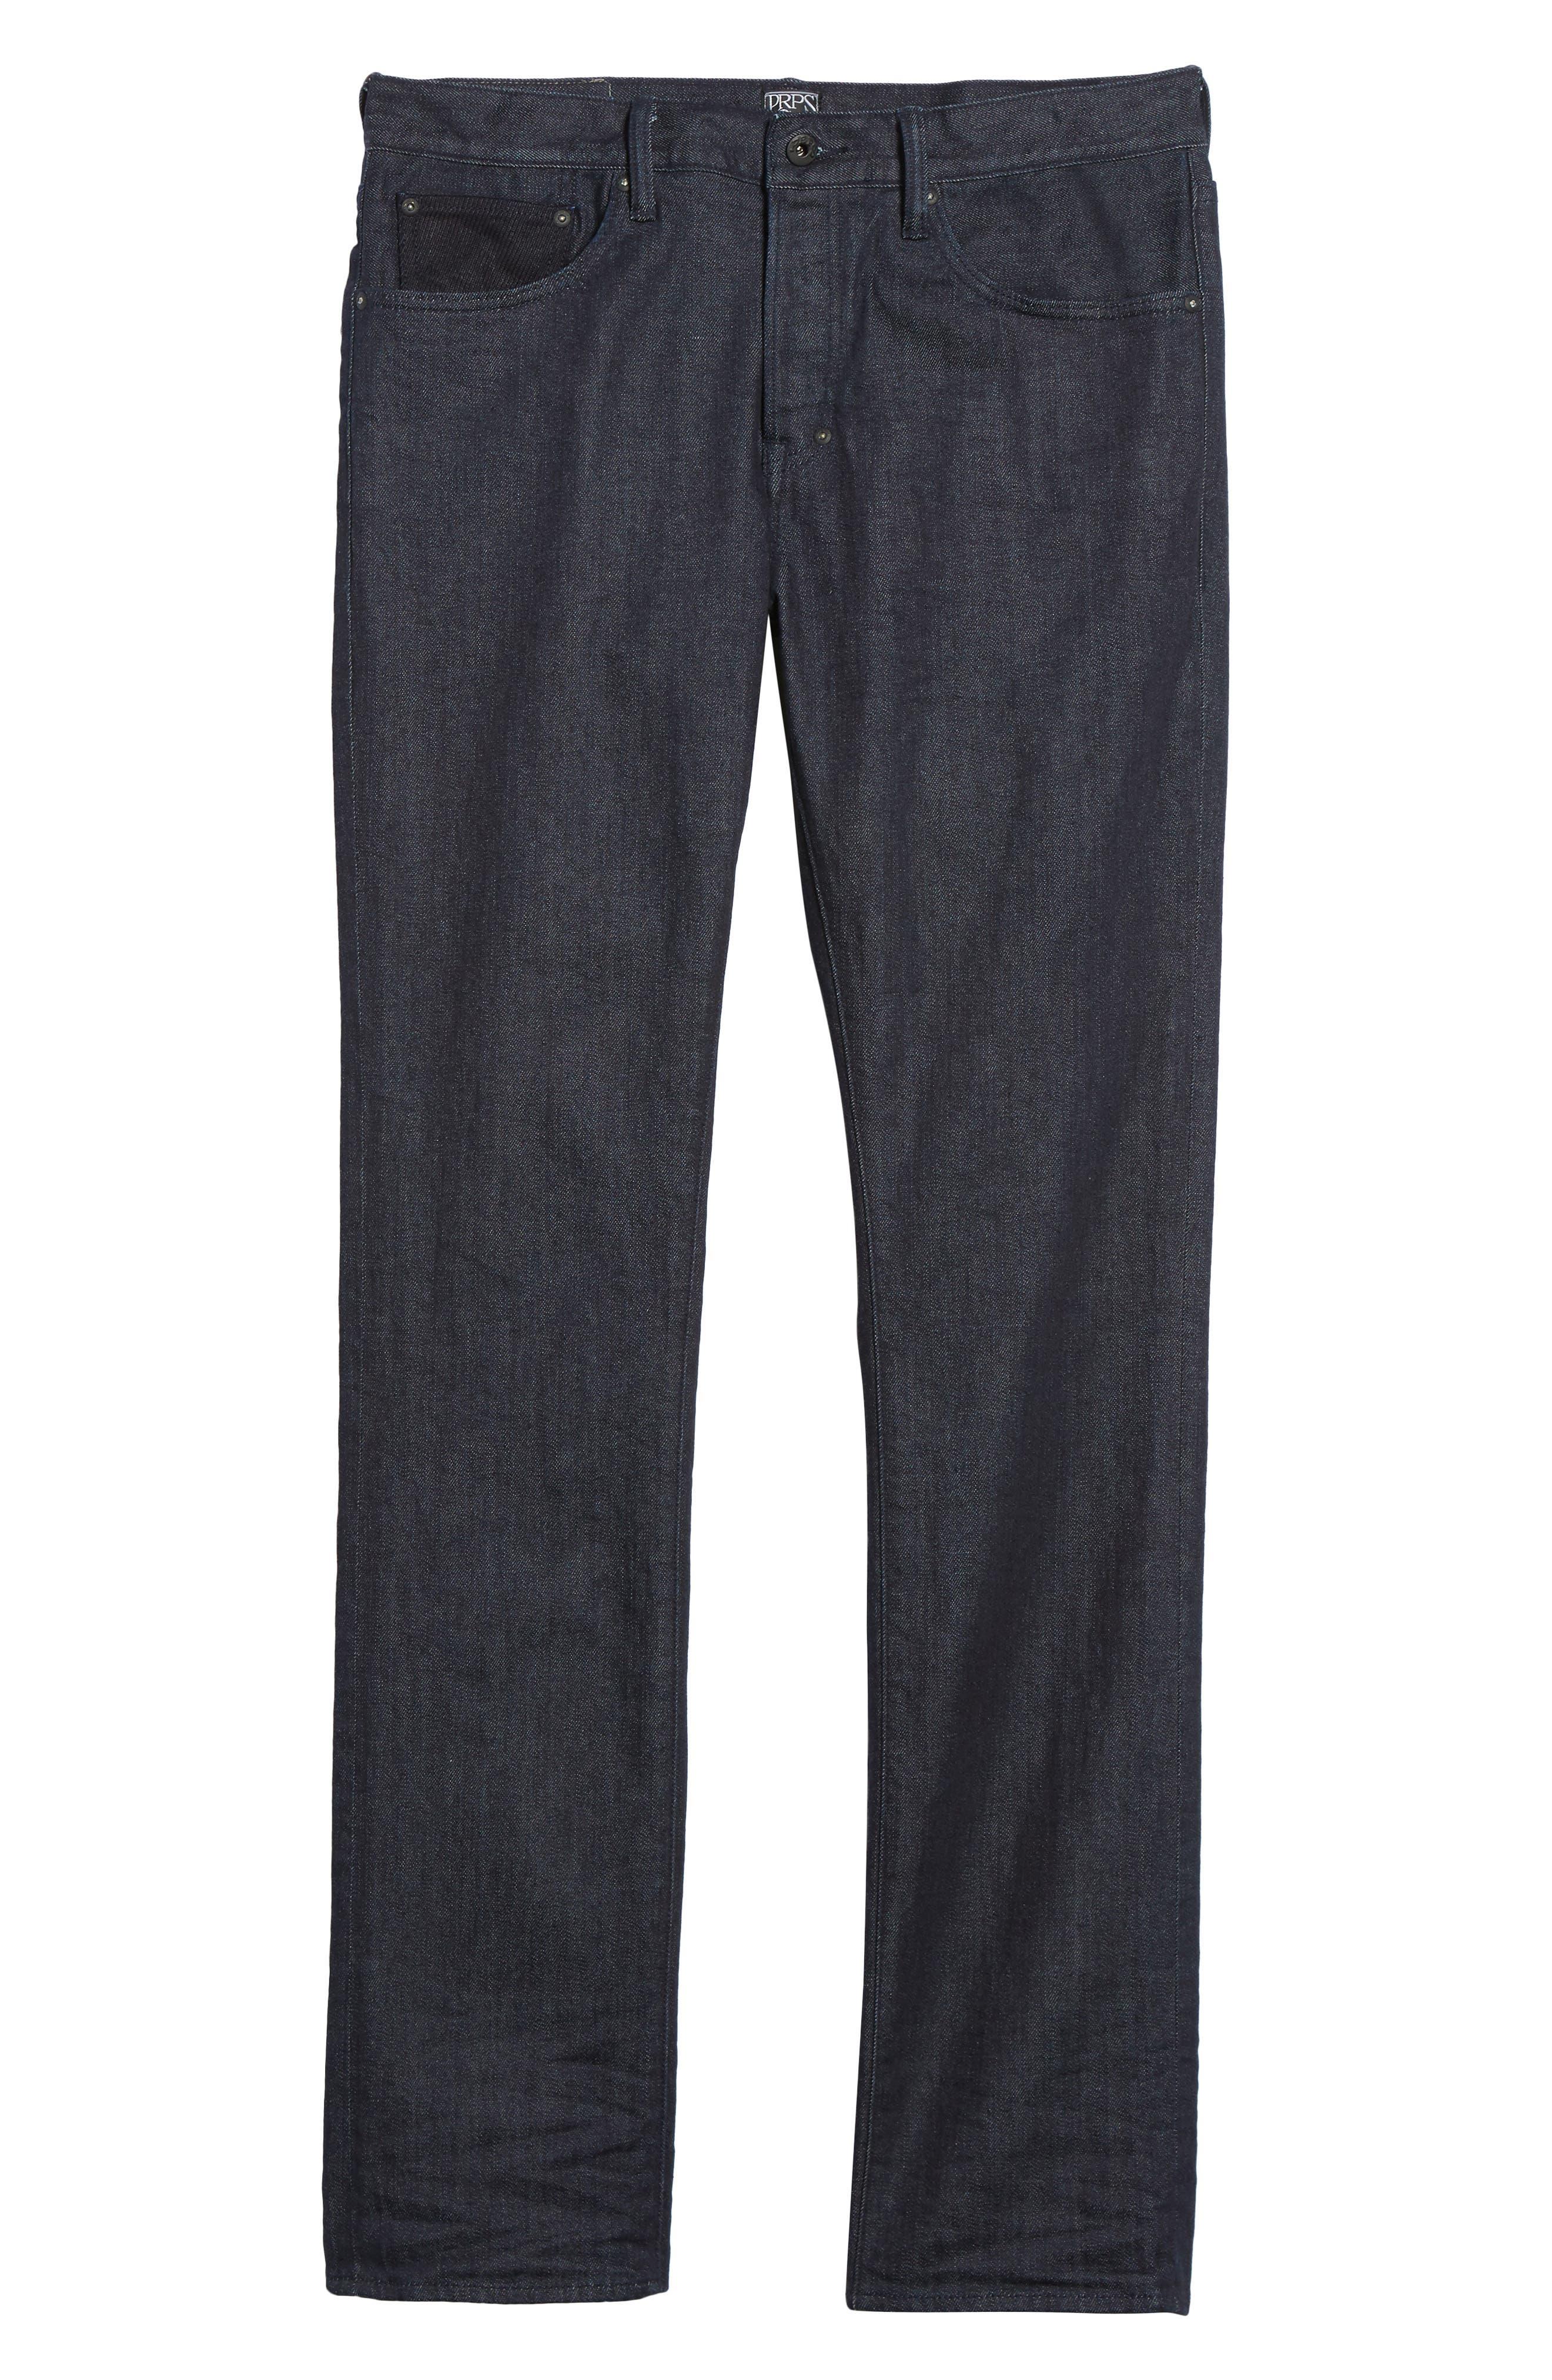 Demon Slim Straight Leg Jeans,                             Alternate thumbnail 6, color,                             Rinse